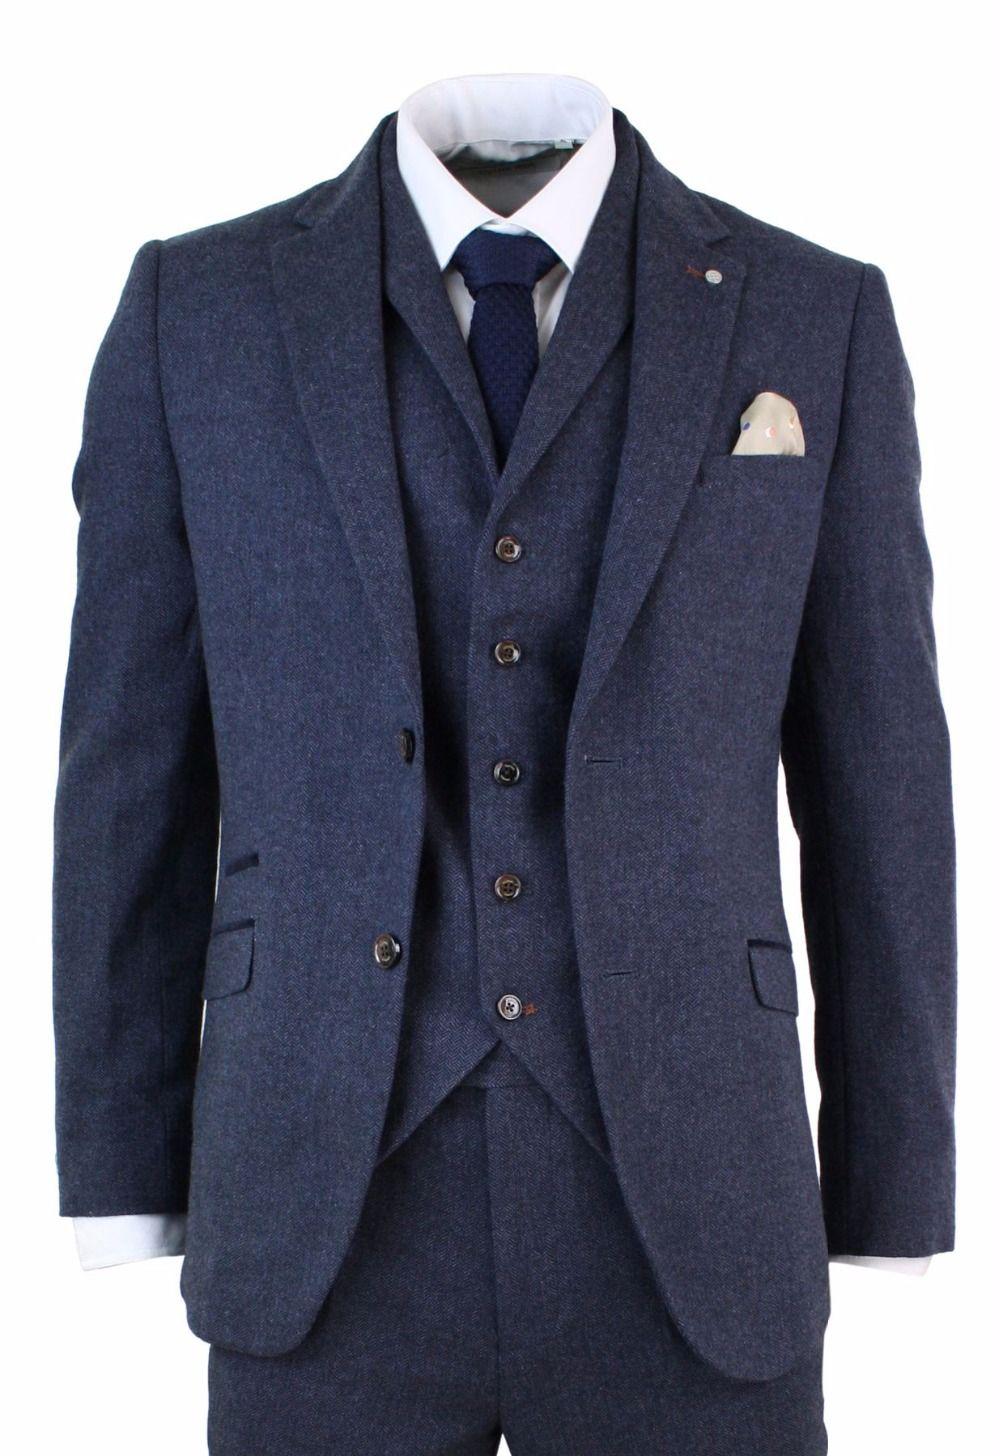 Men/'s Blue 3Piece Classic Vintage Slim Fit Tweed Suits Wedding Suit Custom 36-52